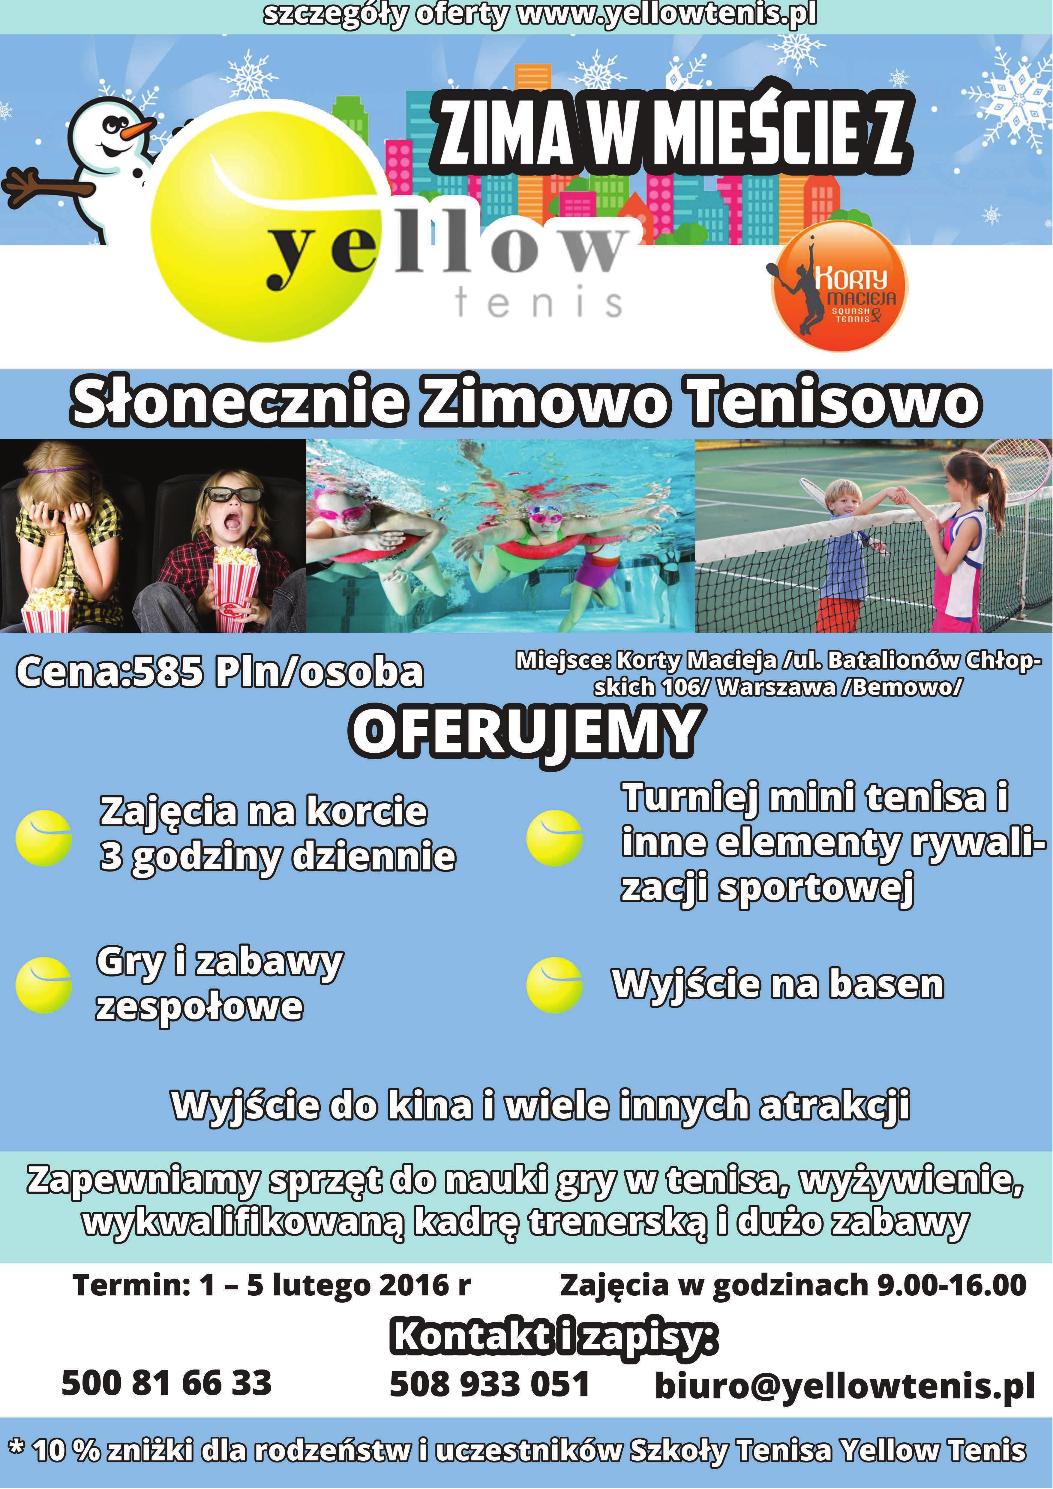 pallkolonie_pro_futuro_pdf.png